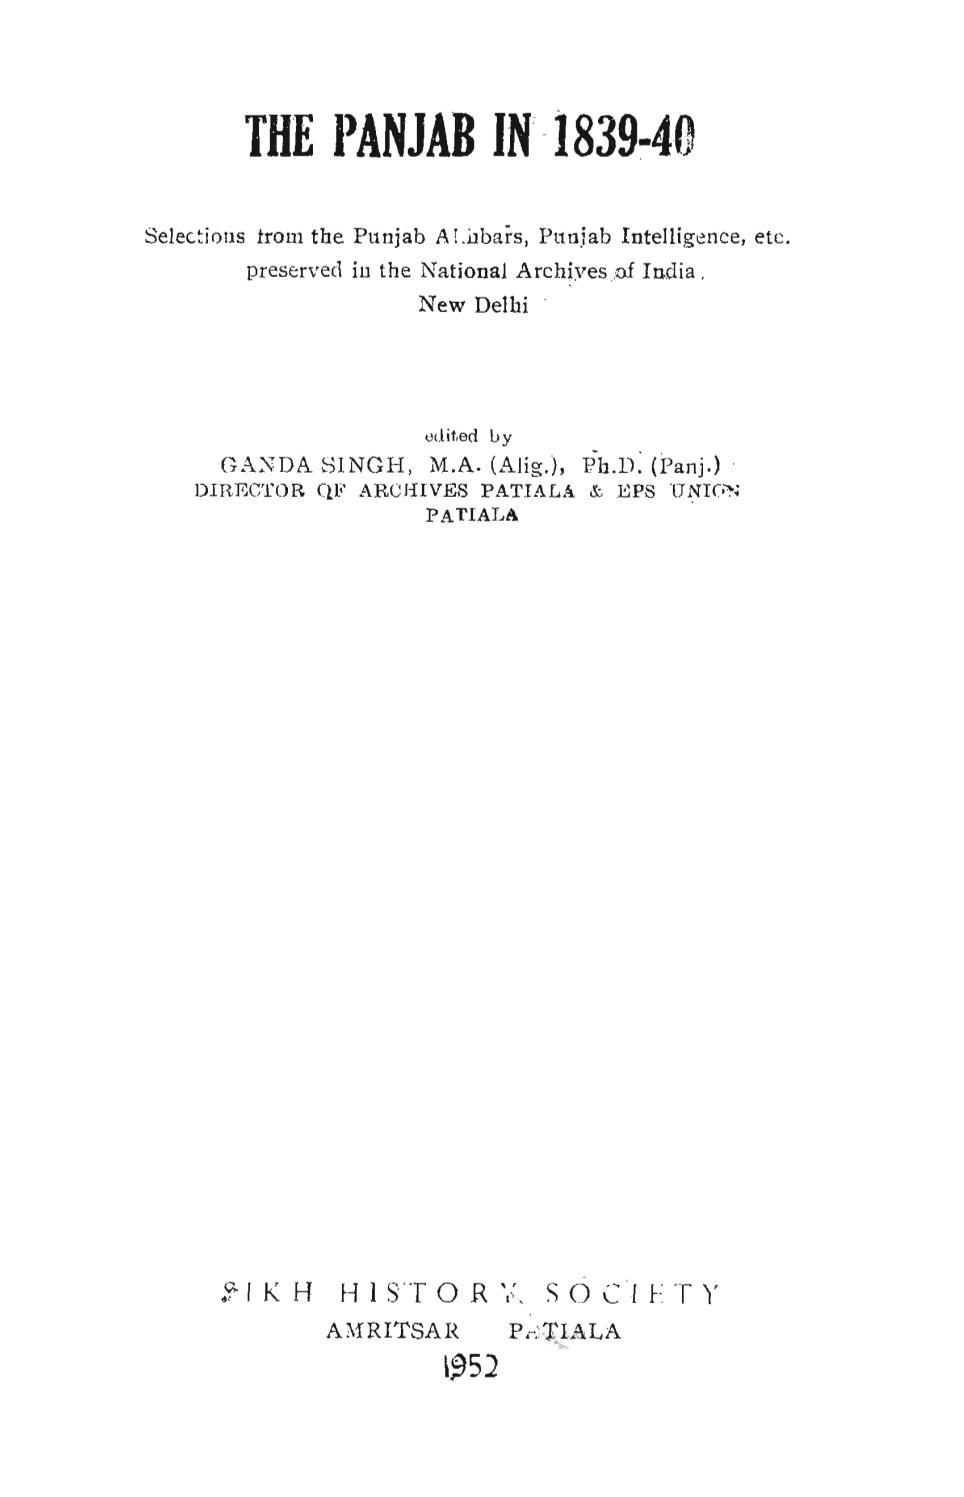 The panjab in 1839 40 selections from the punjab akhbars, punjab ...